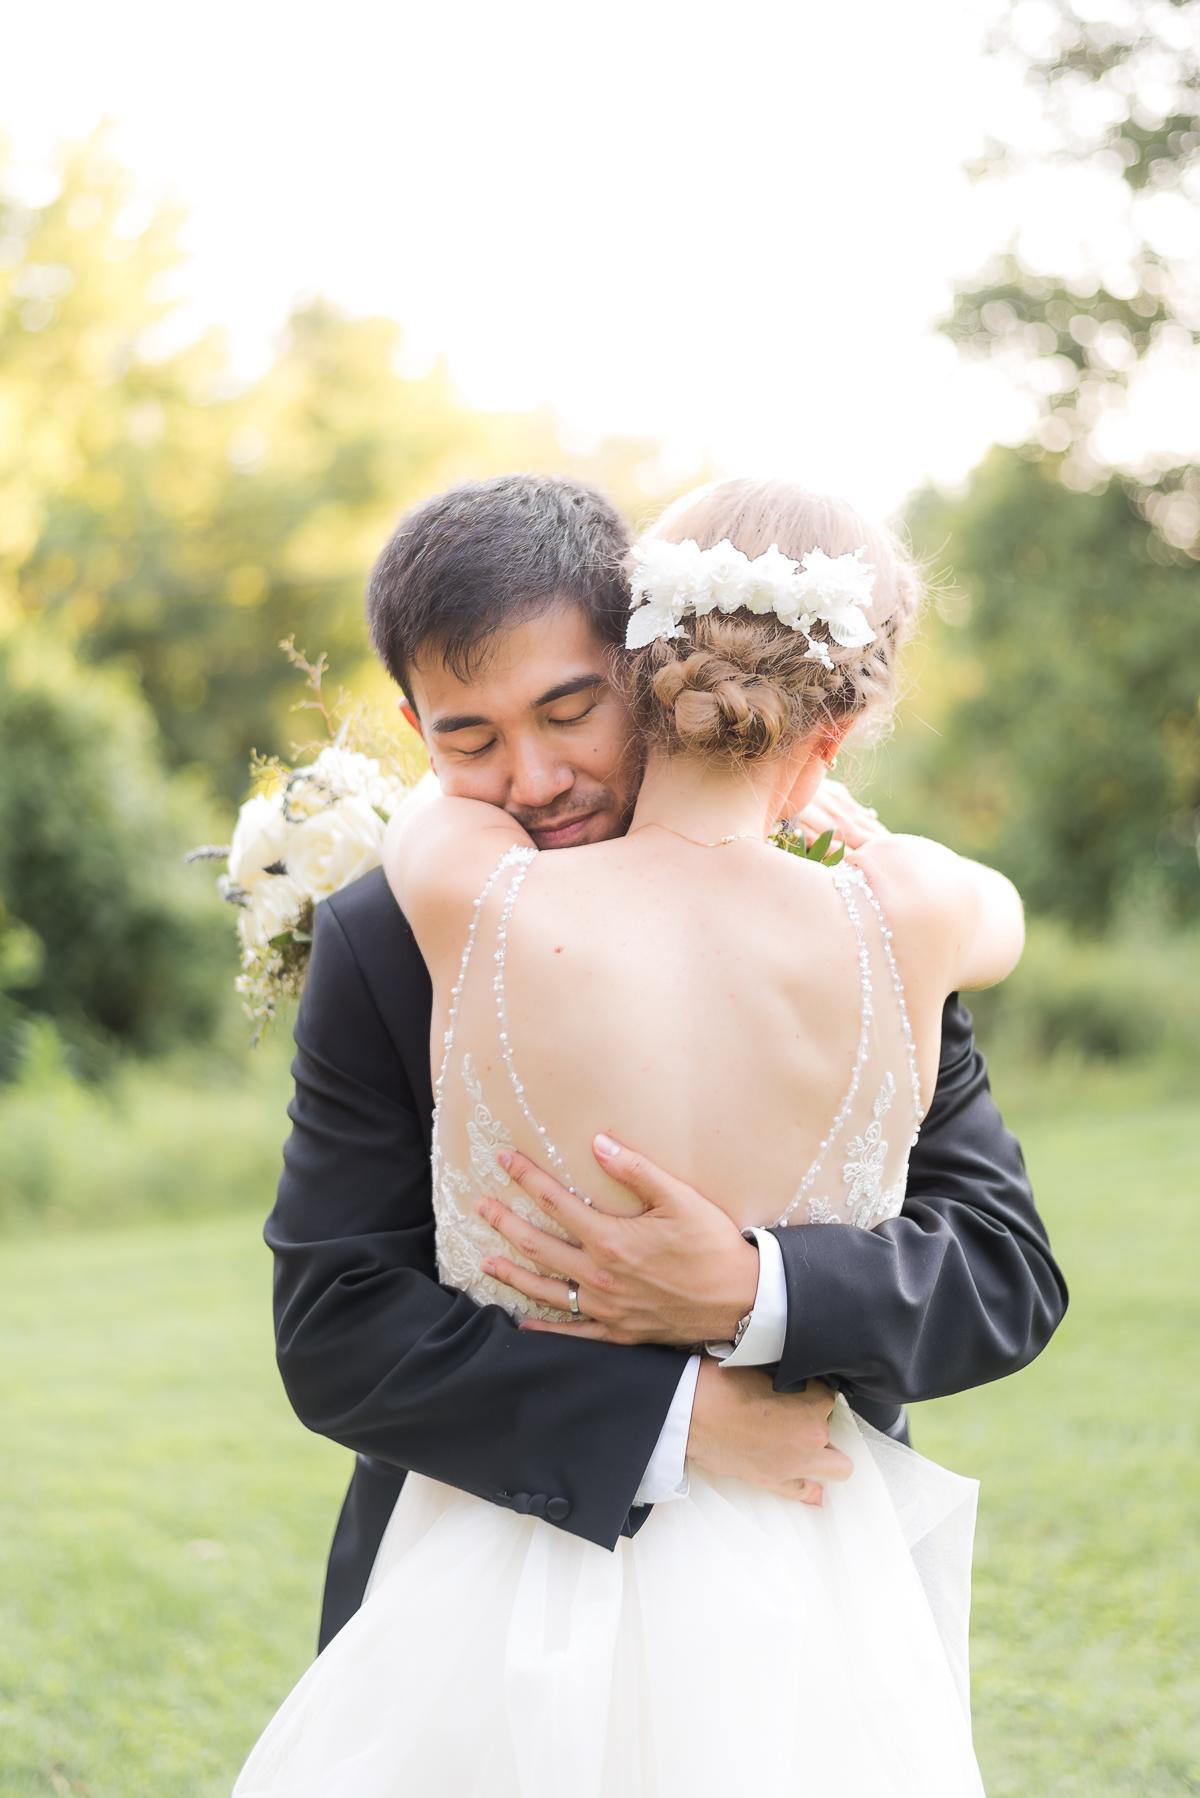 Elkridge-Furnace-Inn-Wedding-Reception-Bride-Groom-34